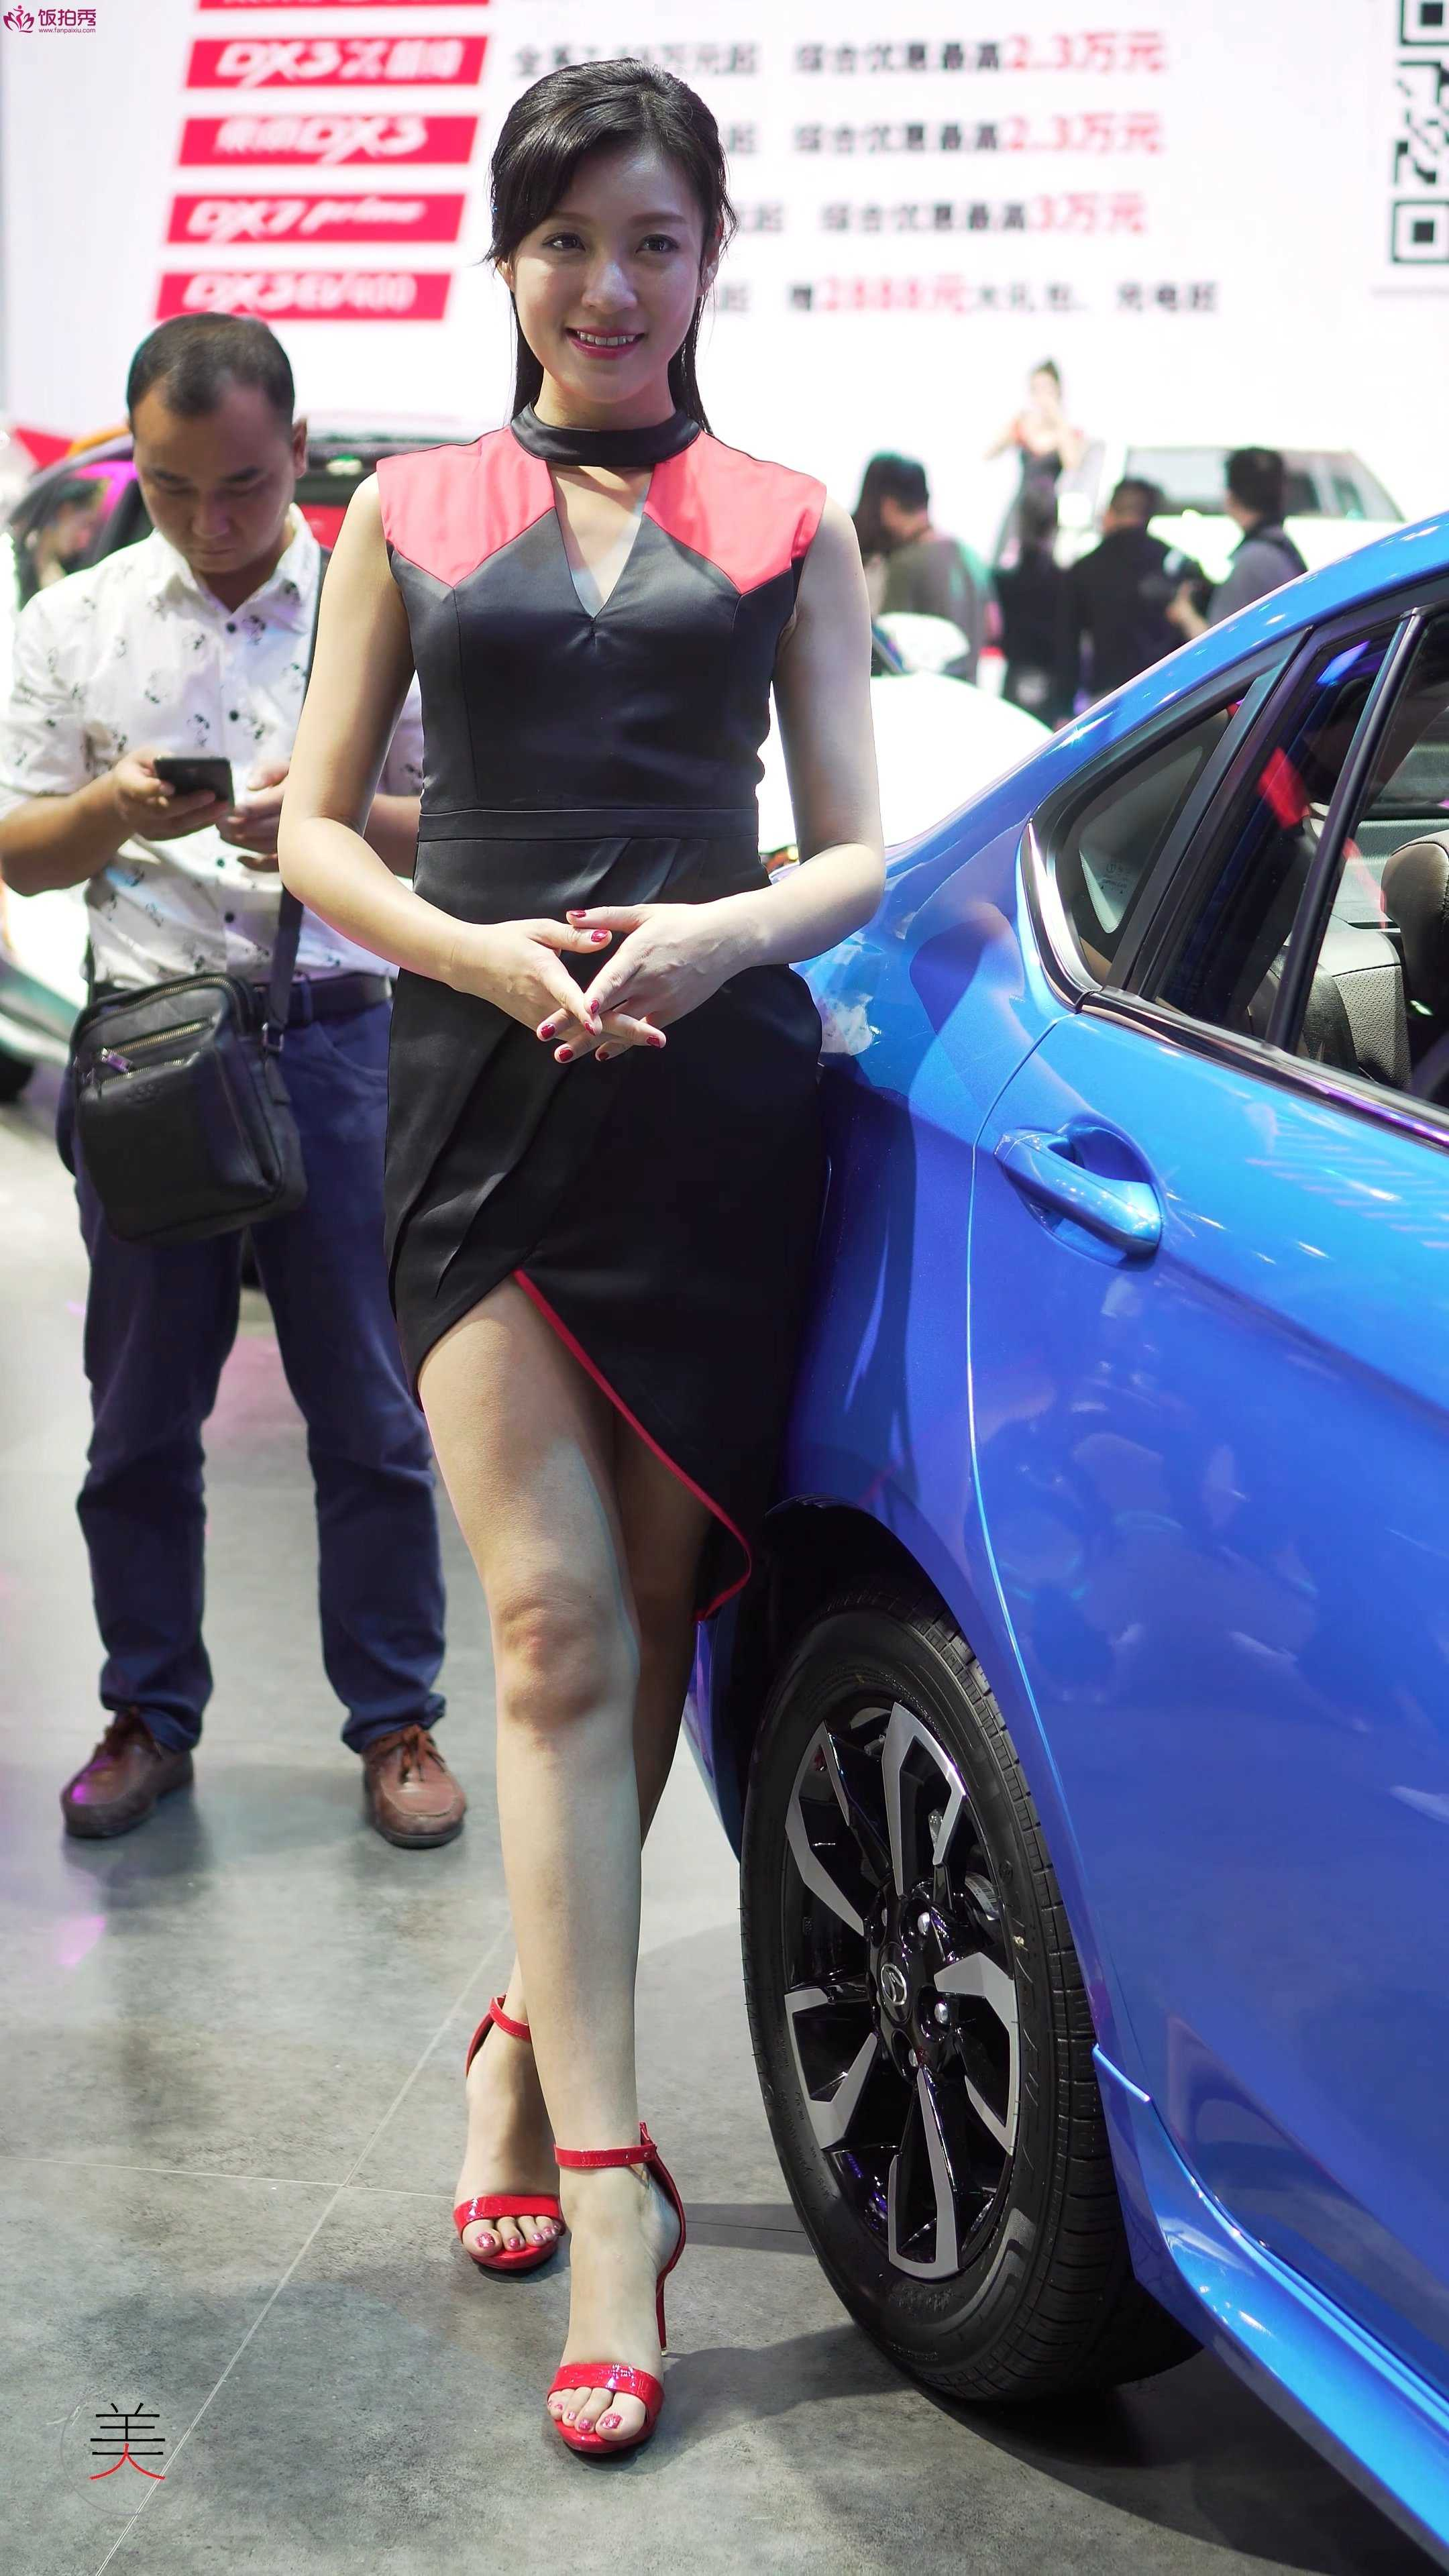 [3P][饭拍秀.3013-16][190313][2019北京Racing Model ShowGirl][蓝光4K]